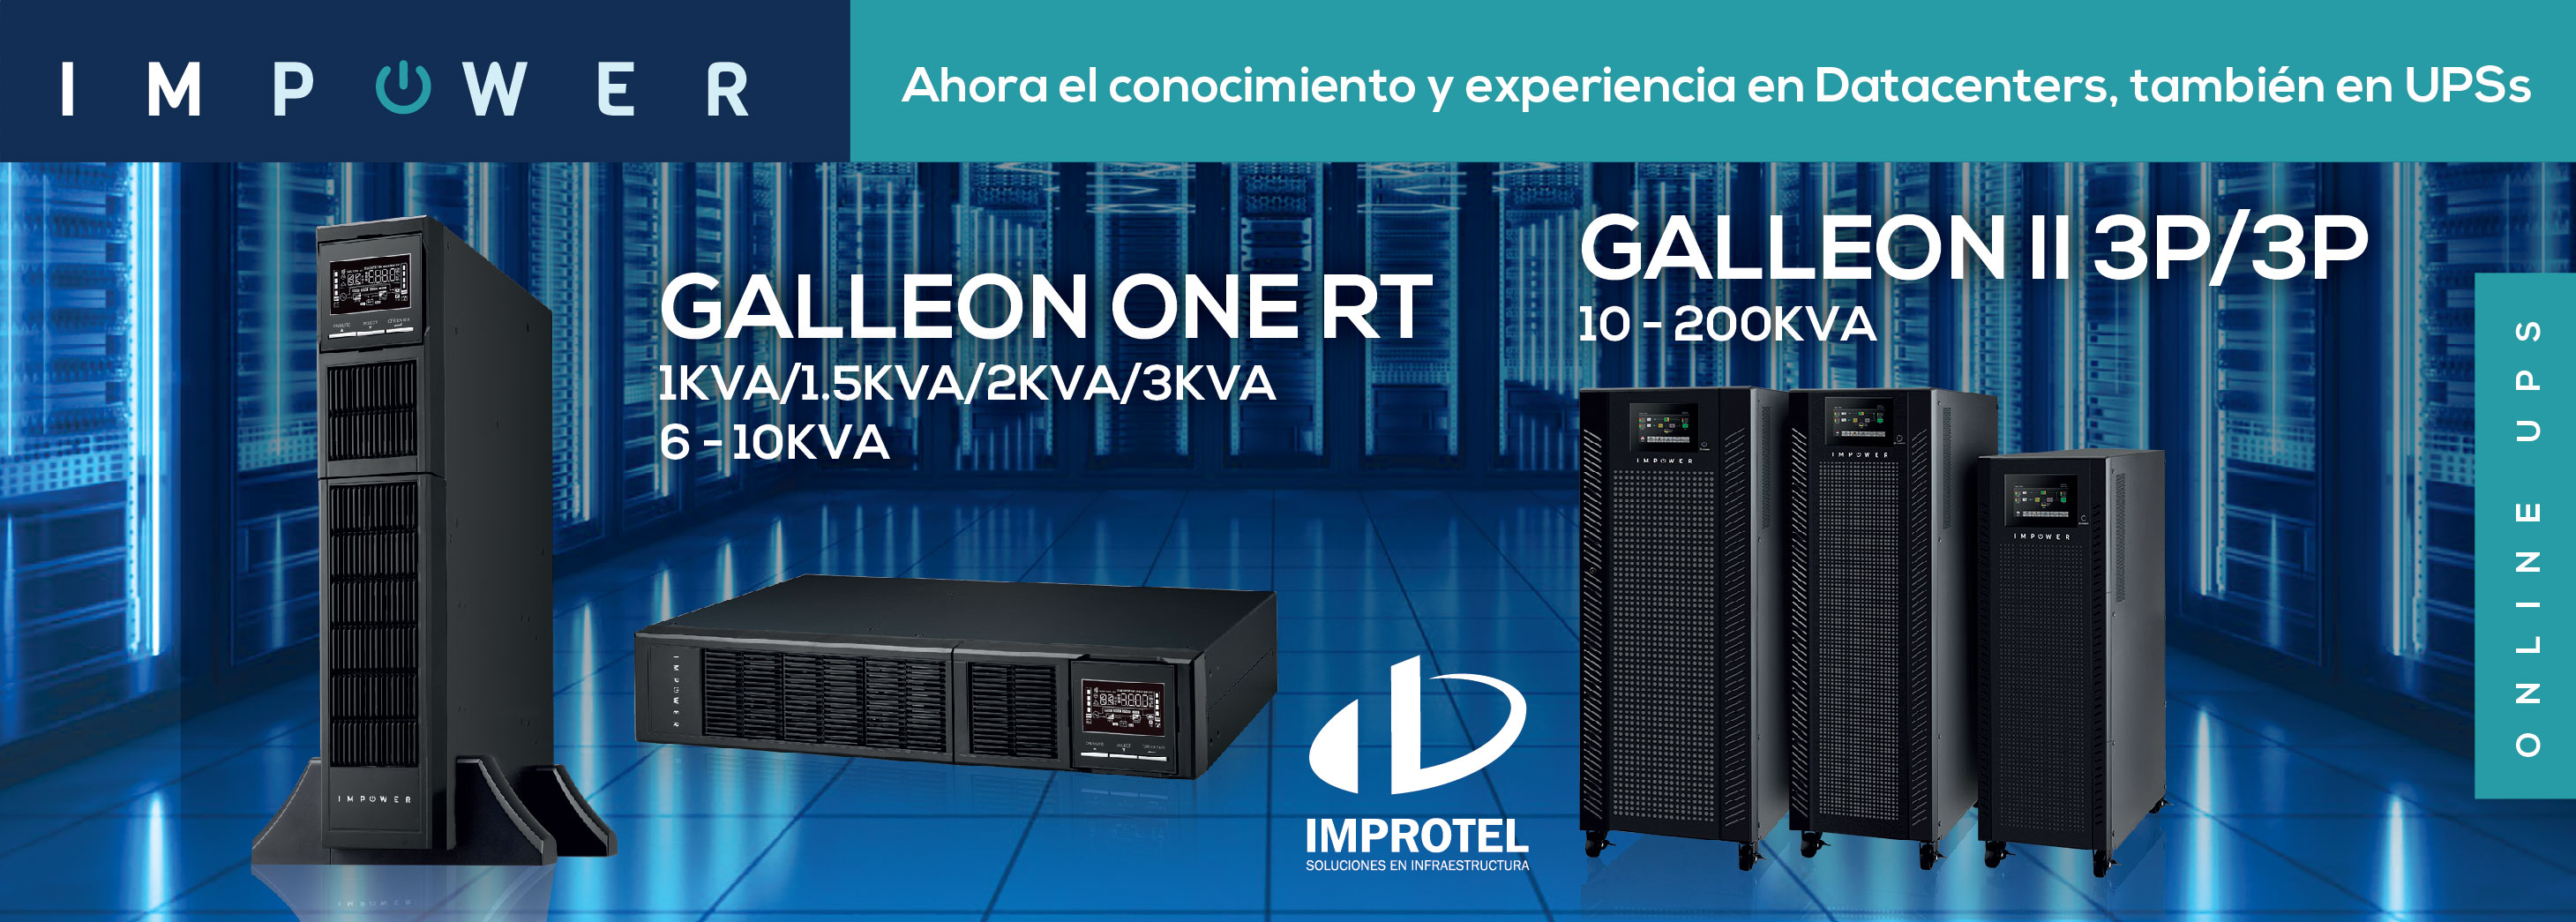 2021-10-12 Importel